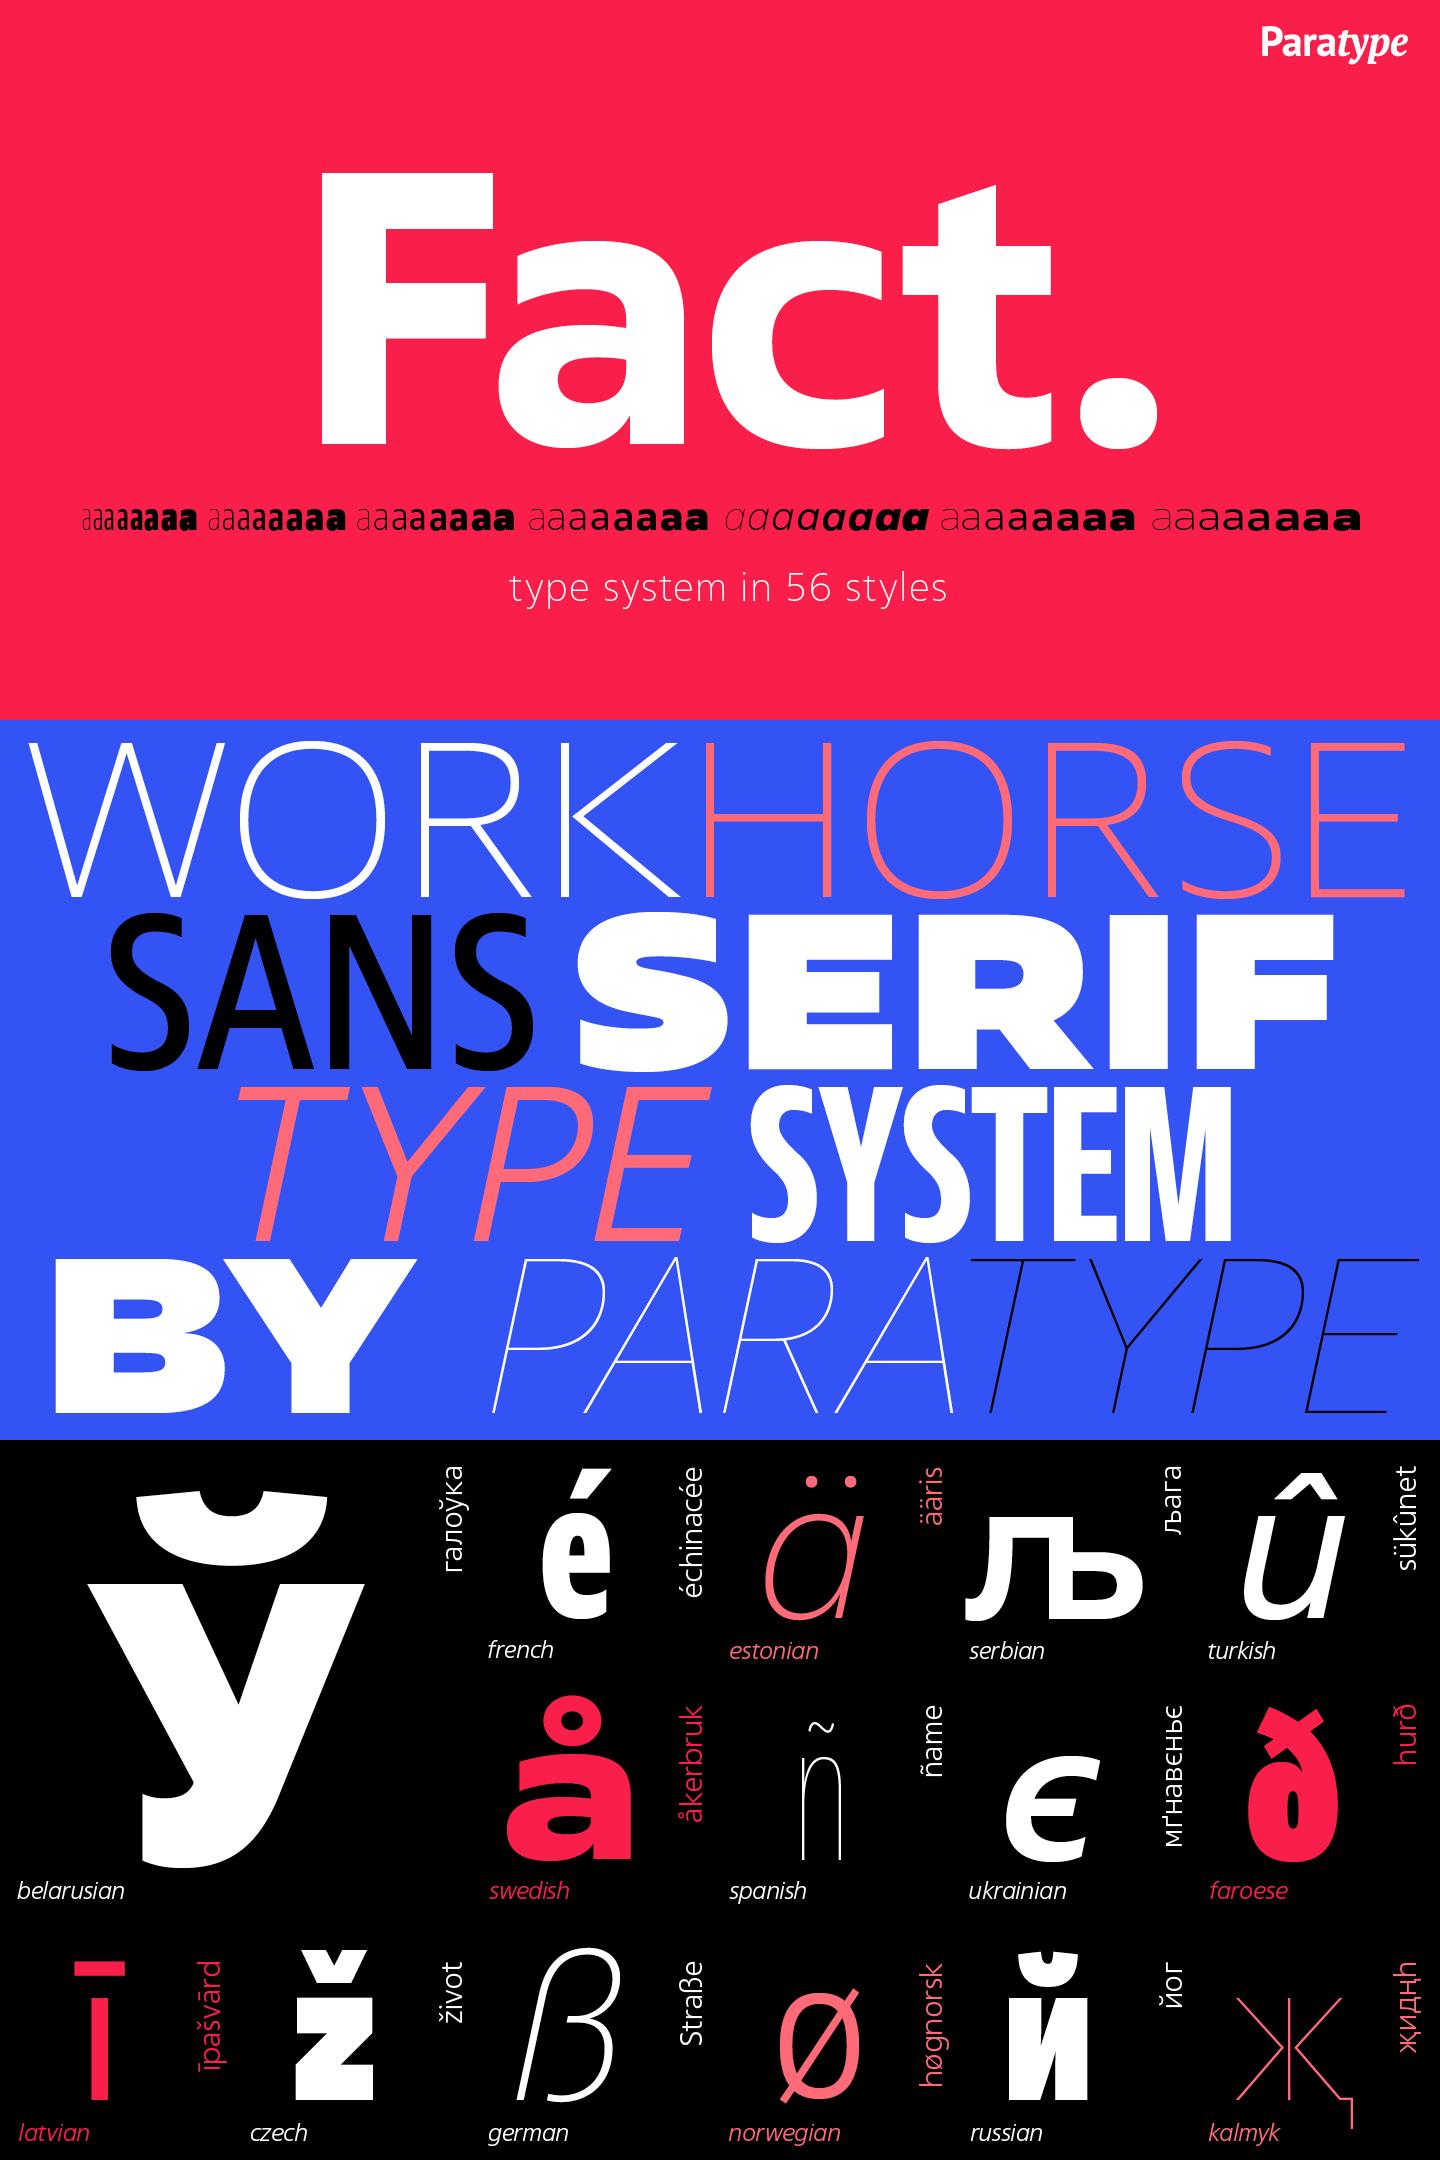 Typeface Fact 56 Fonts By Paratype 2018 Font For Web Desktop On Rentafont Facts Fonts Lettering